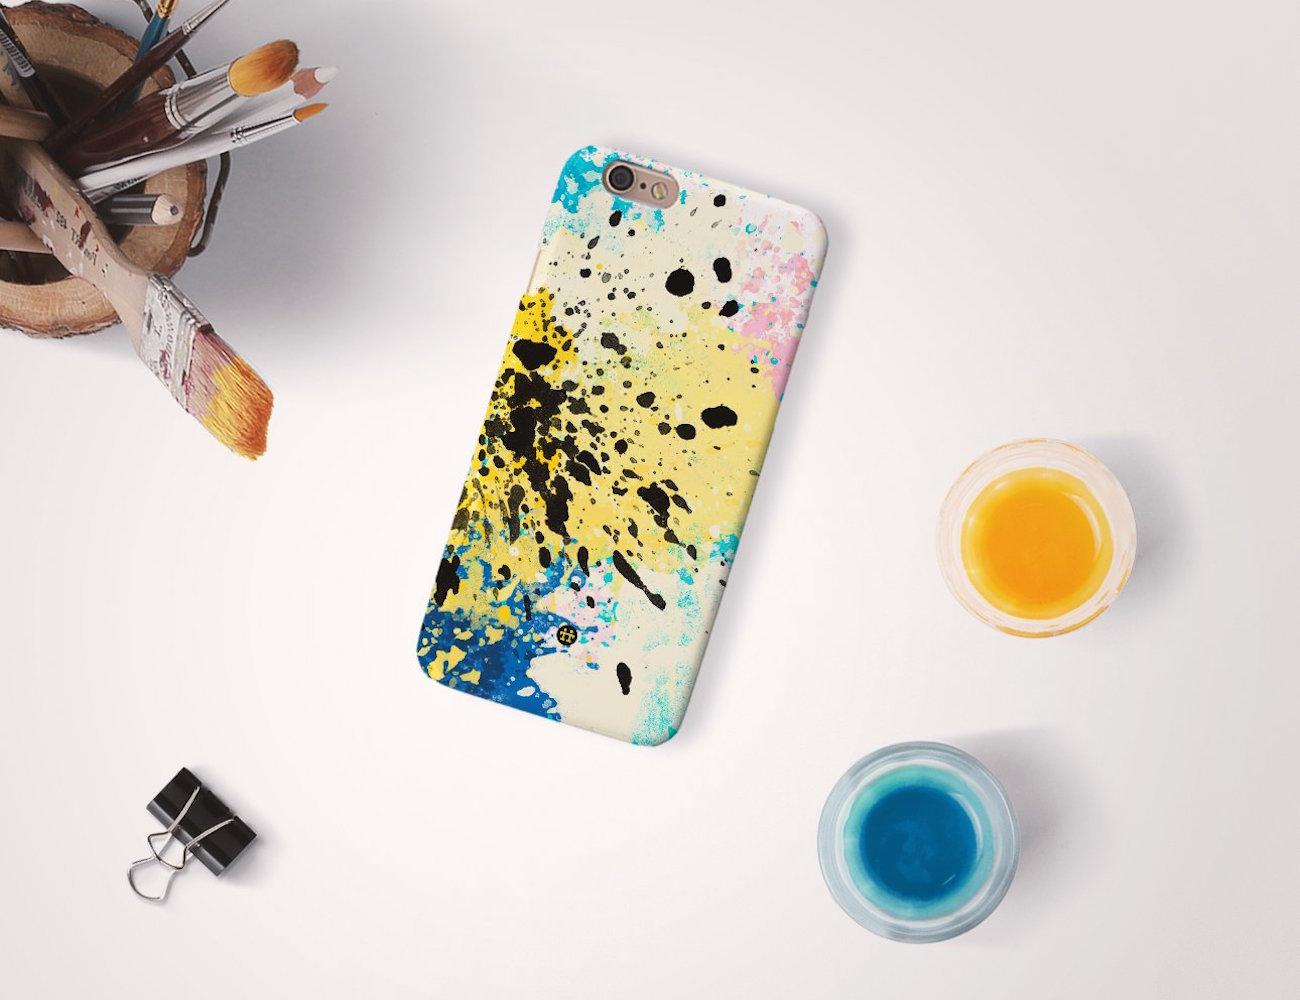 CMYK+Splash+Art+Phone+Case+By+Madotta